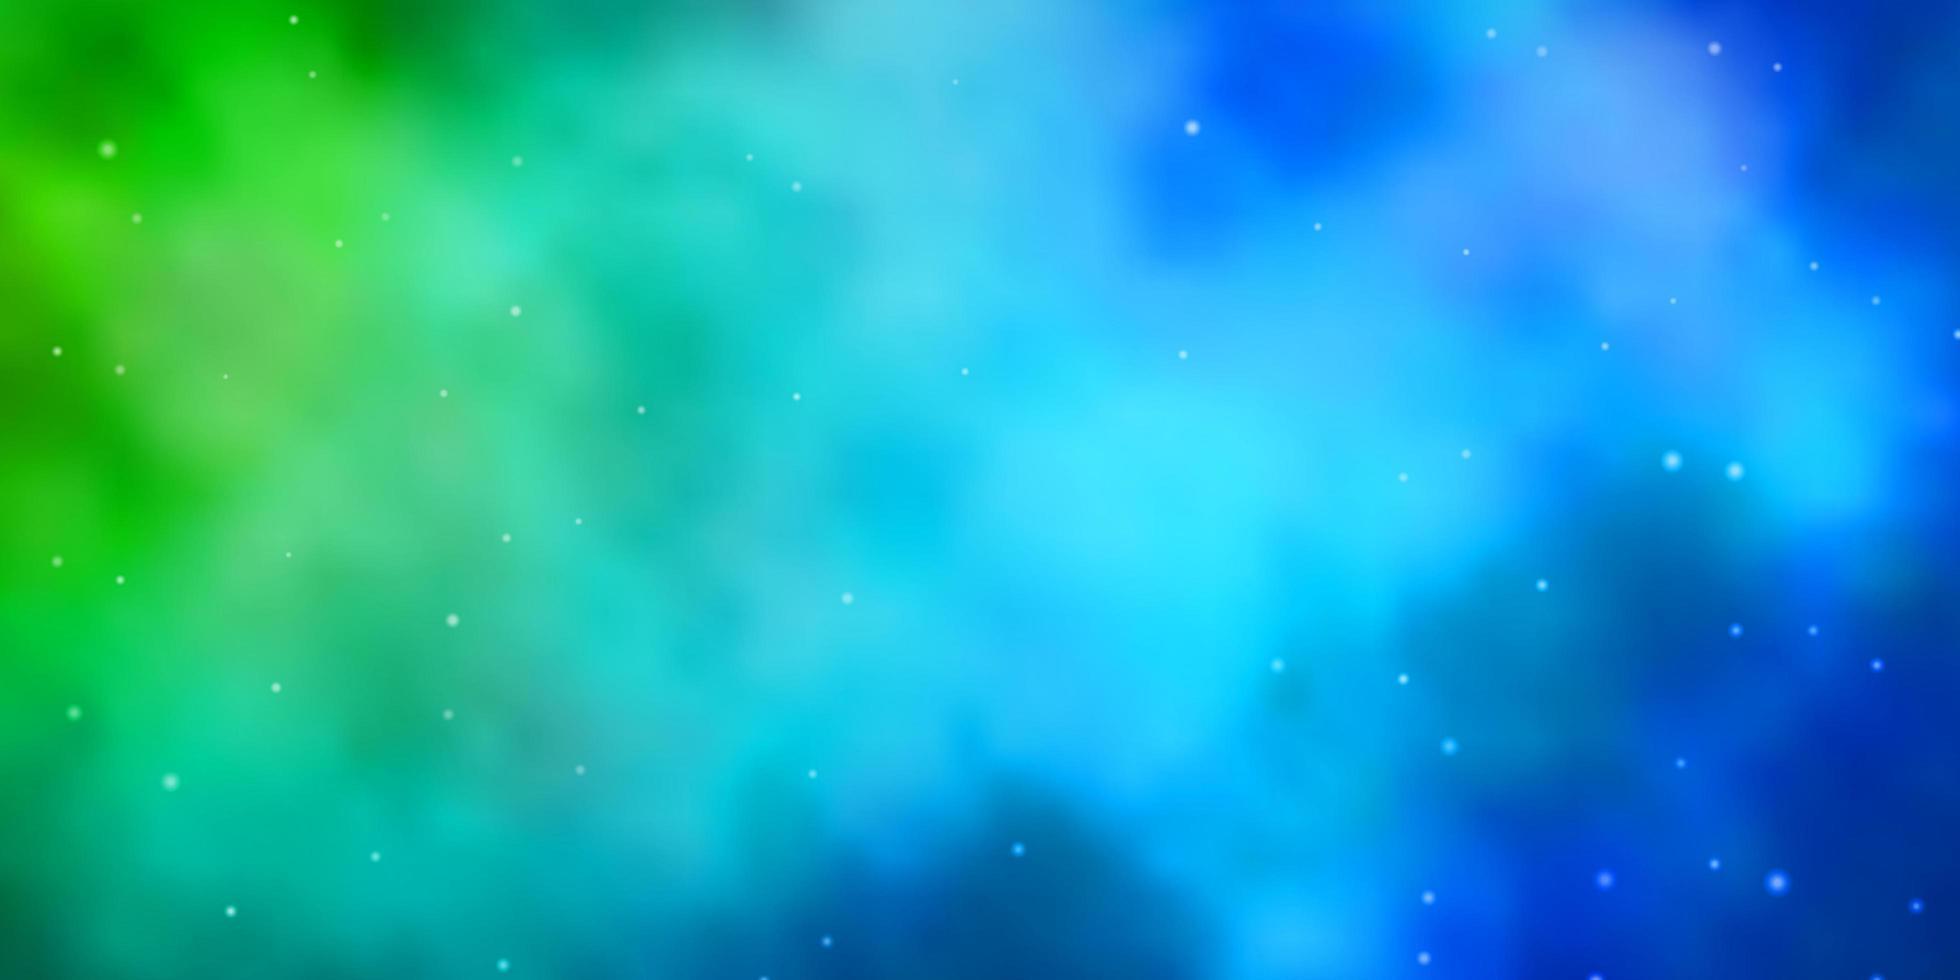 azzurro, layout verde con stelle luminose. vettore